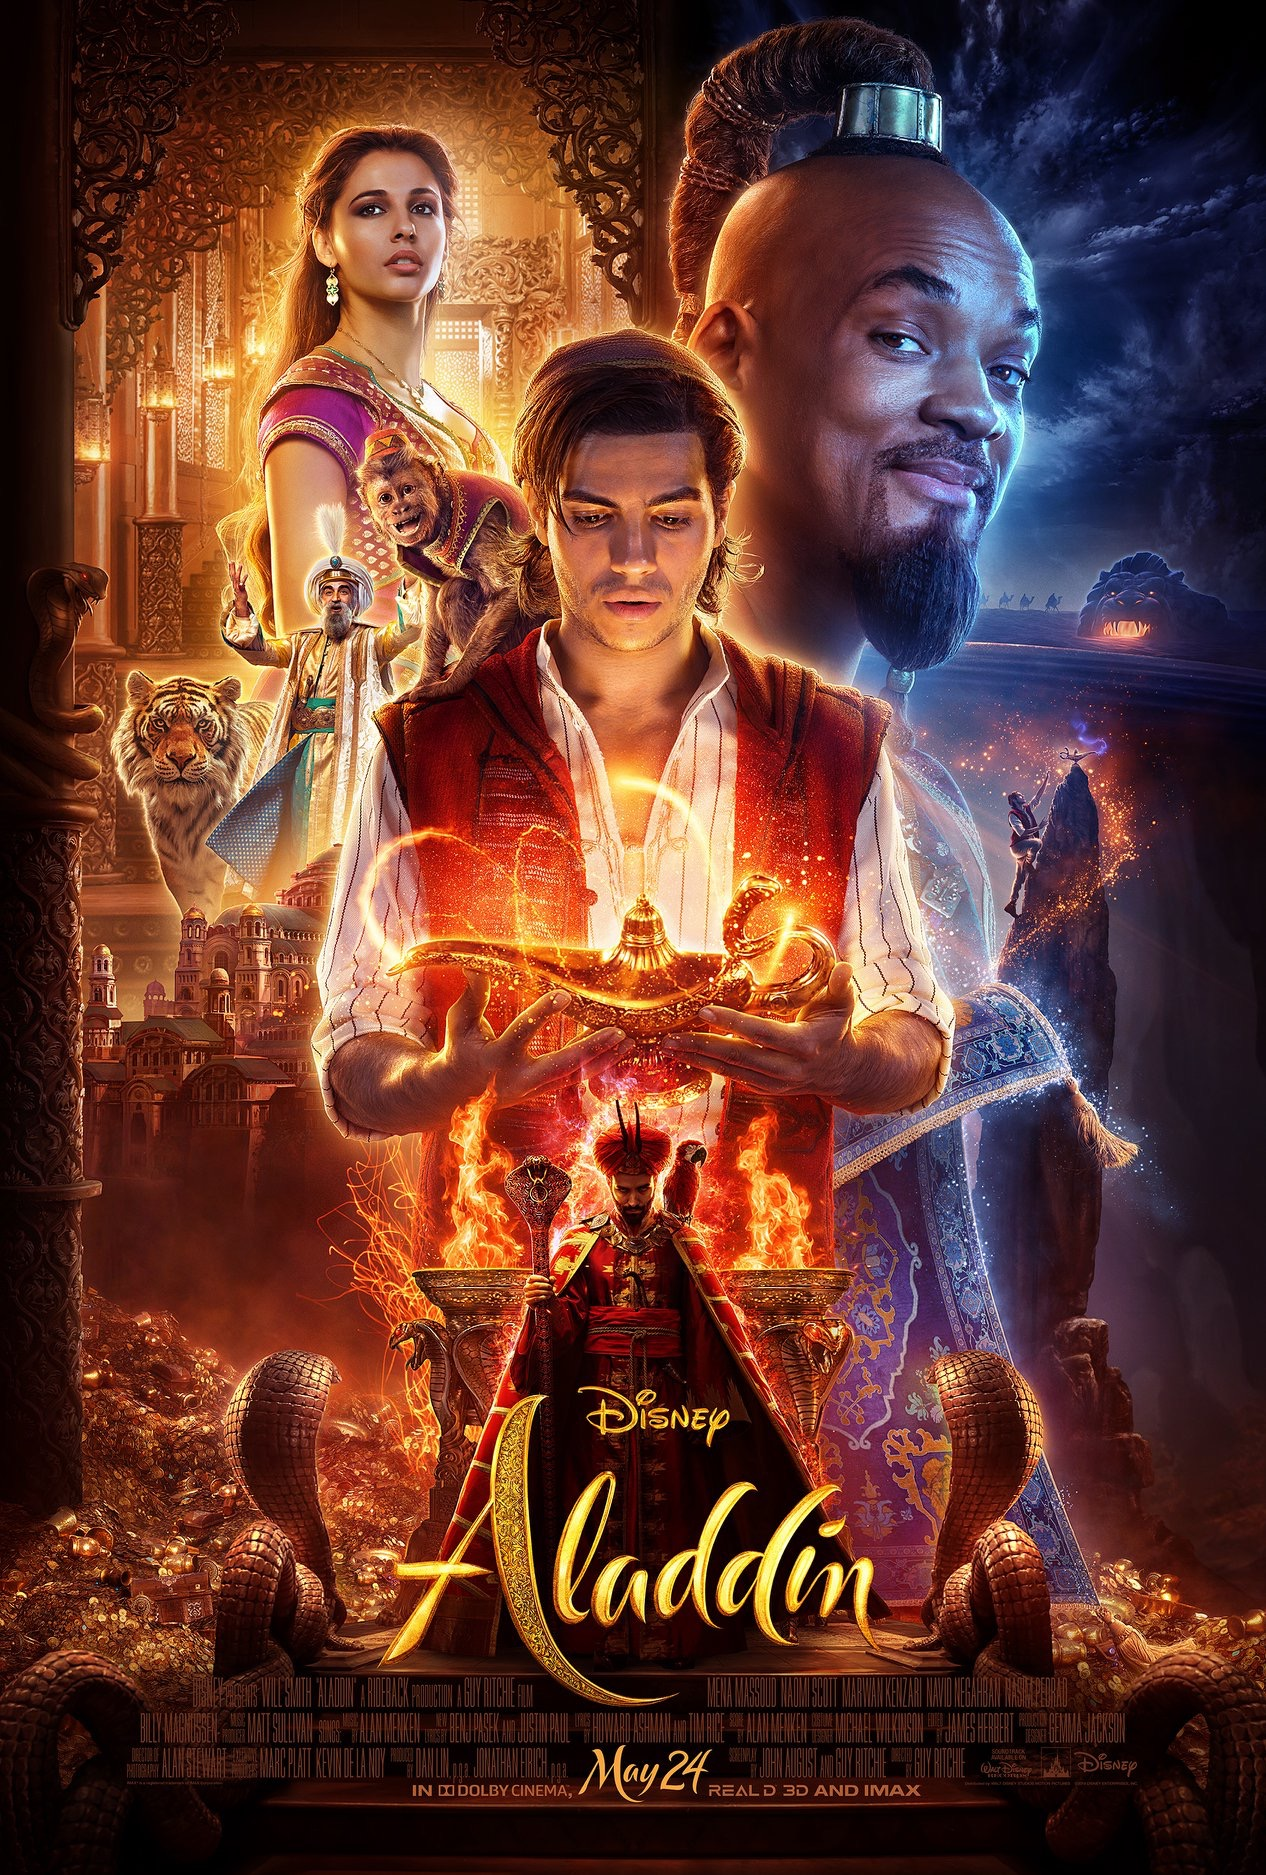 aladdin-3d-movie-2019.jpeg